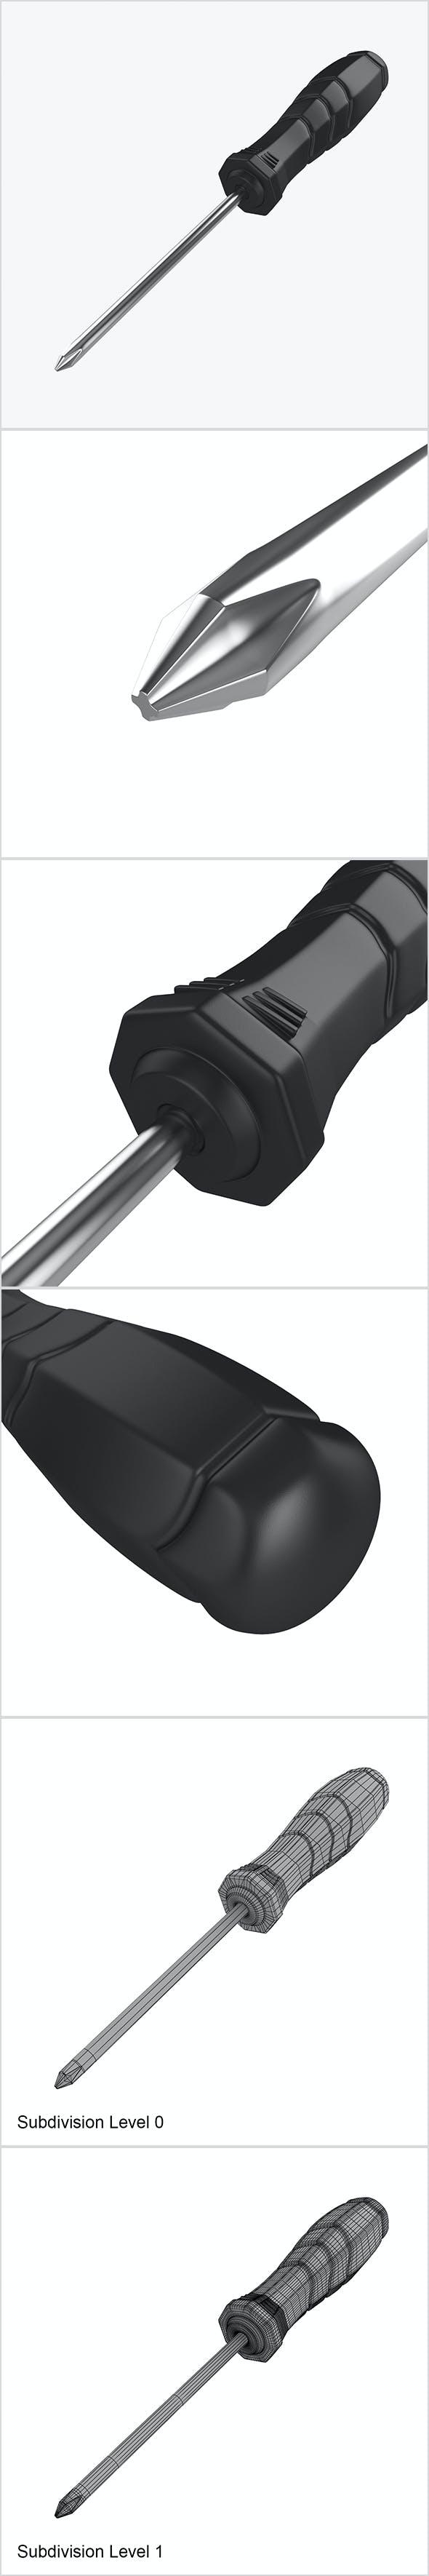 Screwdriver - 3DOcean Item for Sale